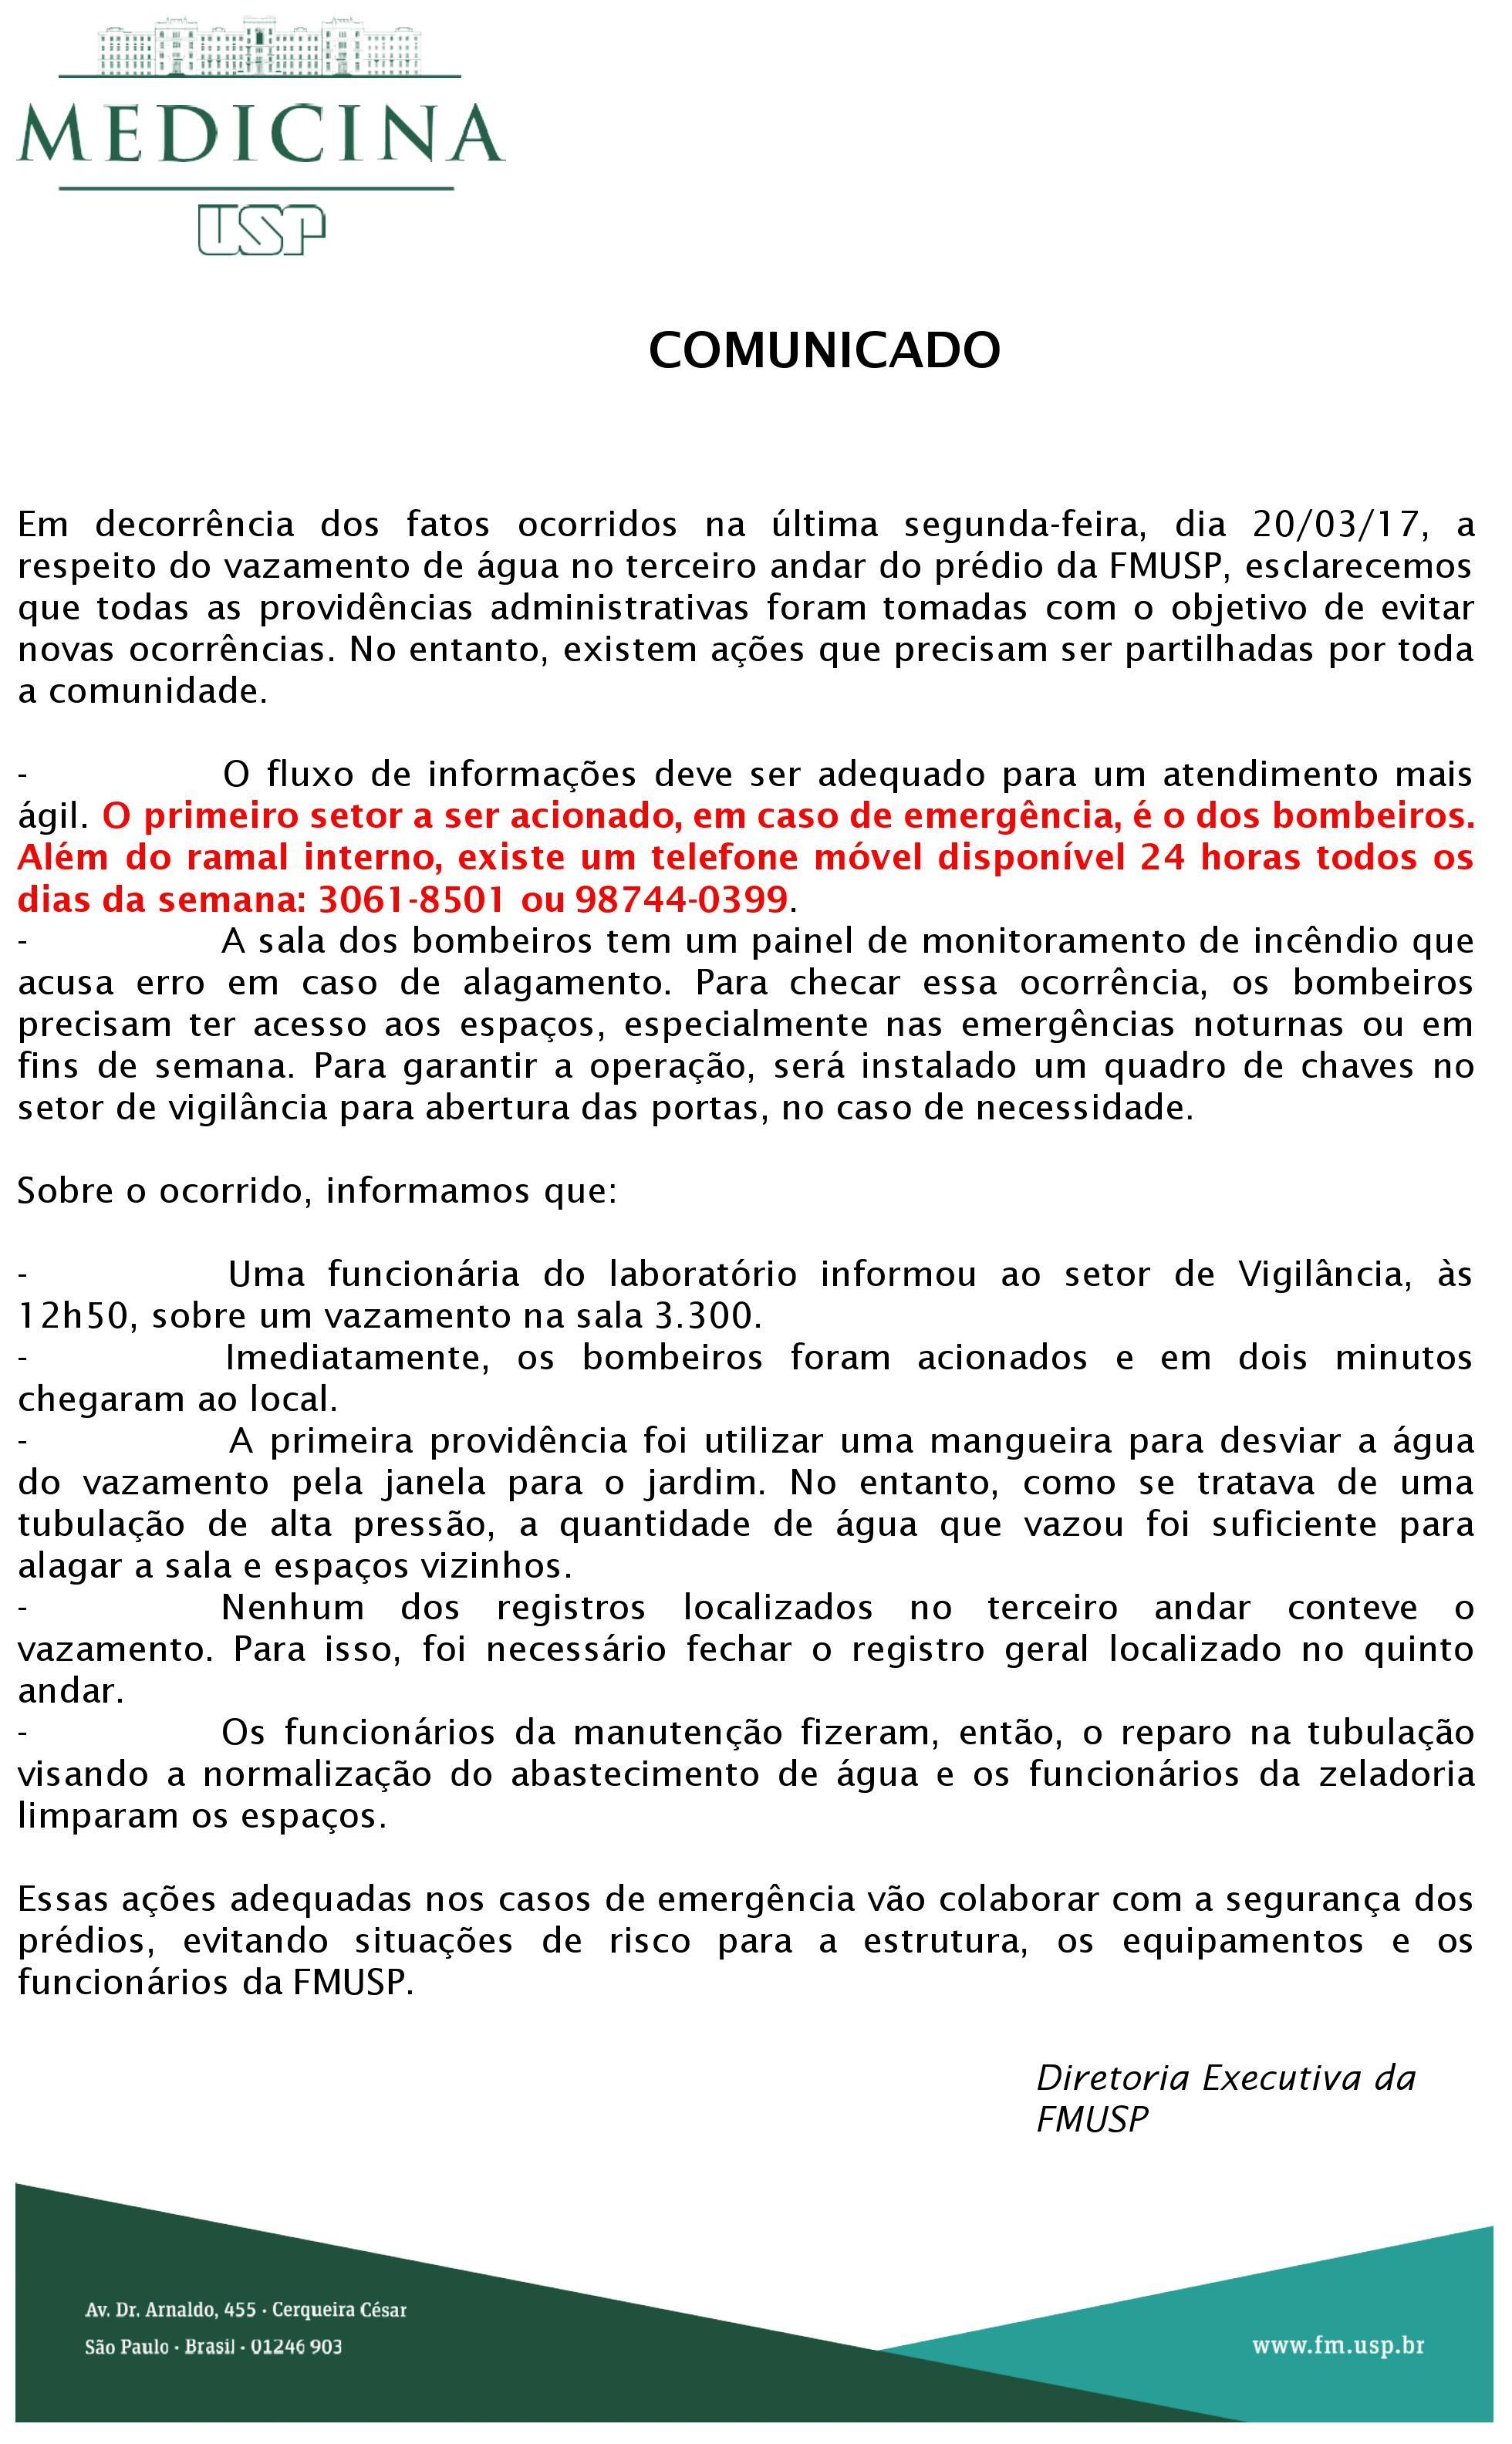 Comunicado_Procedimentos_Emergenciais_Destaque_2017